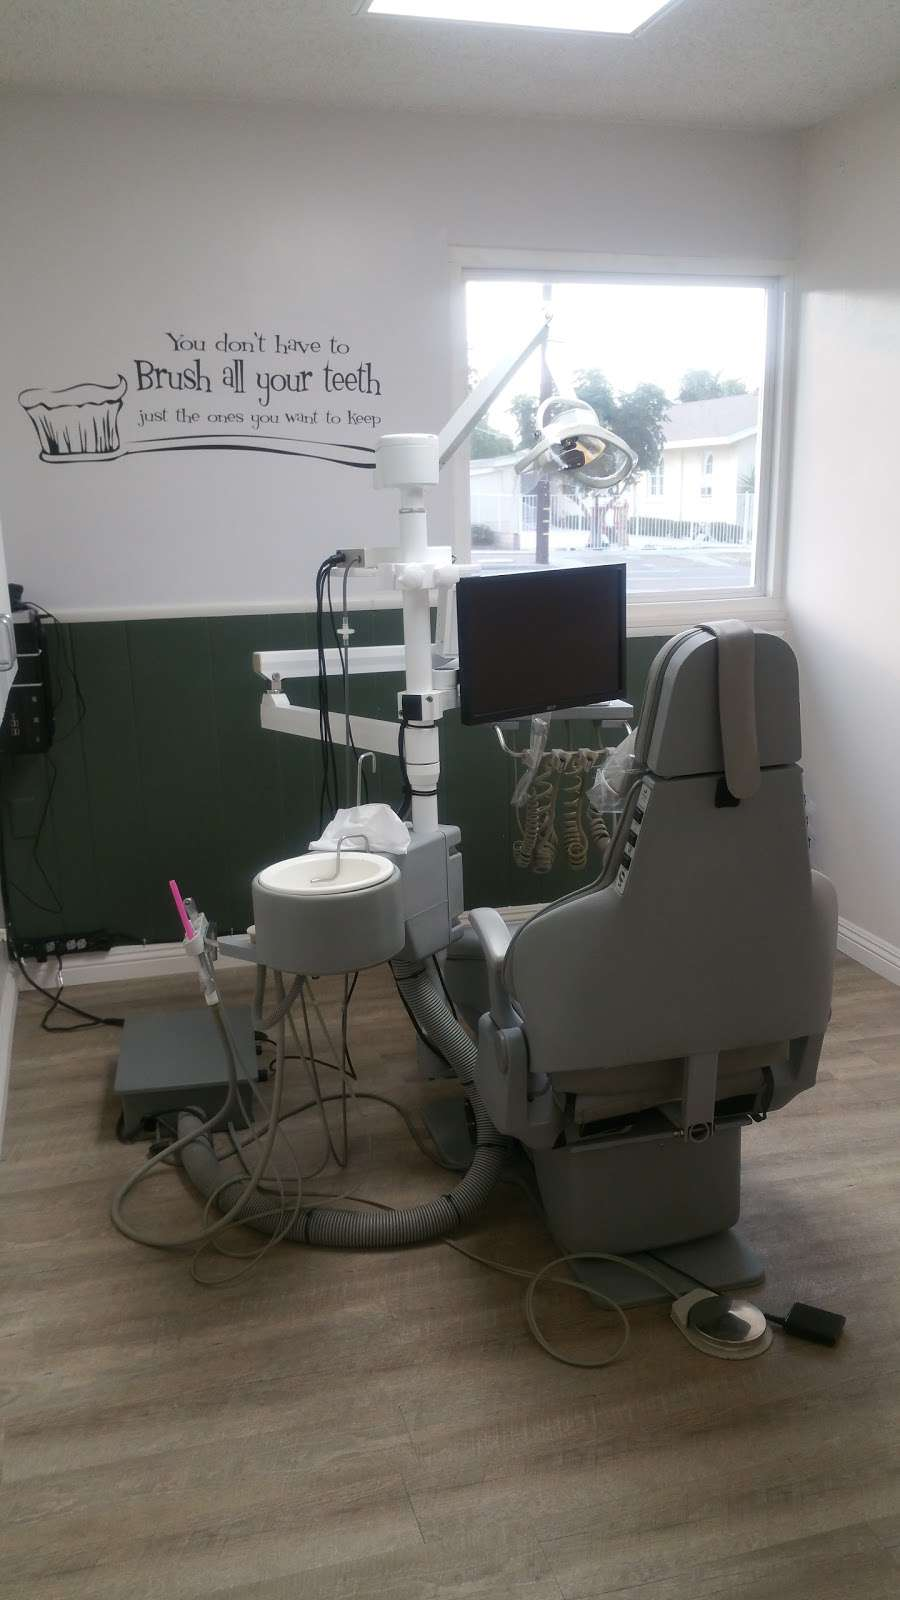 Kilzi Dental Corp - dentist    Photo 5 of 6   Address: B, 4455, 1113, S Main St, Corona, CA 92882, USA   Phone: (951) 739-0752